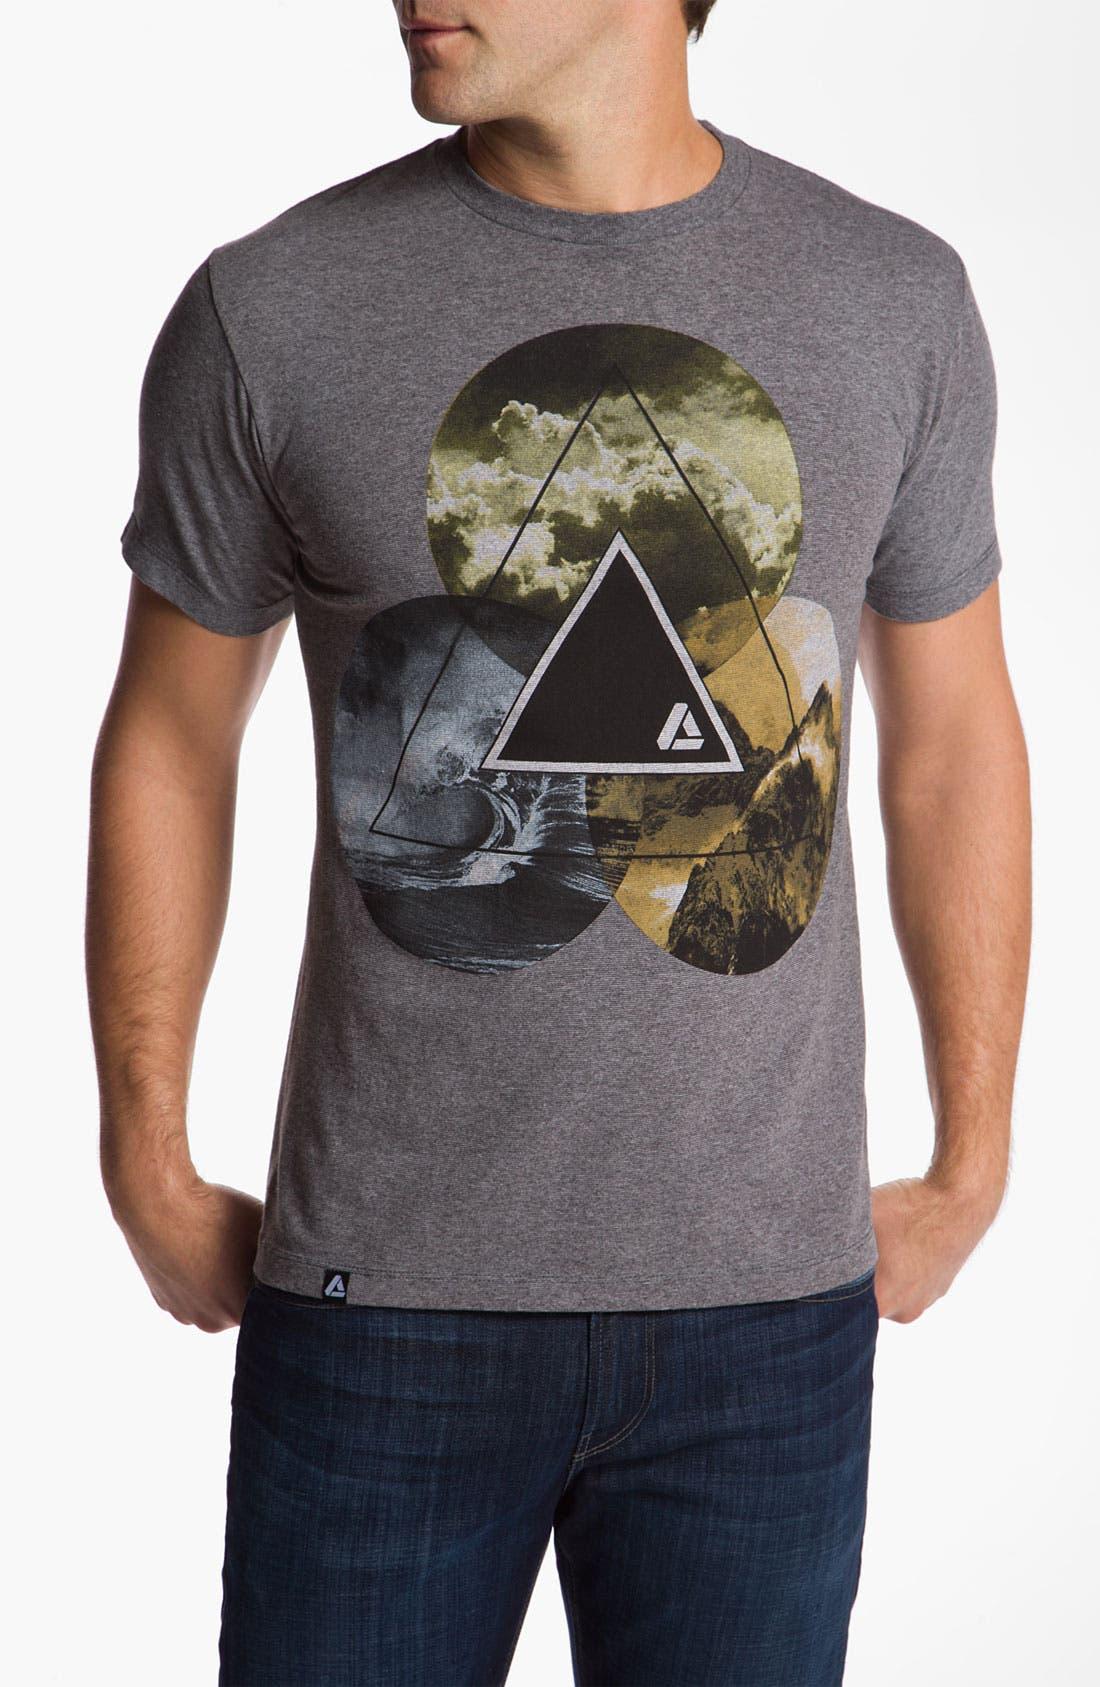 Alternate Image 1 Selected - Lira Clothing 'Elements' T-Shirt